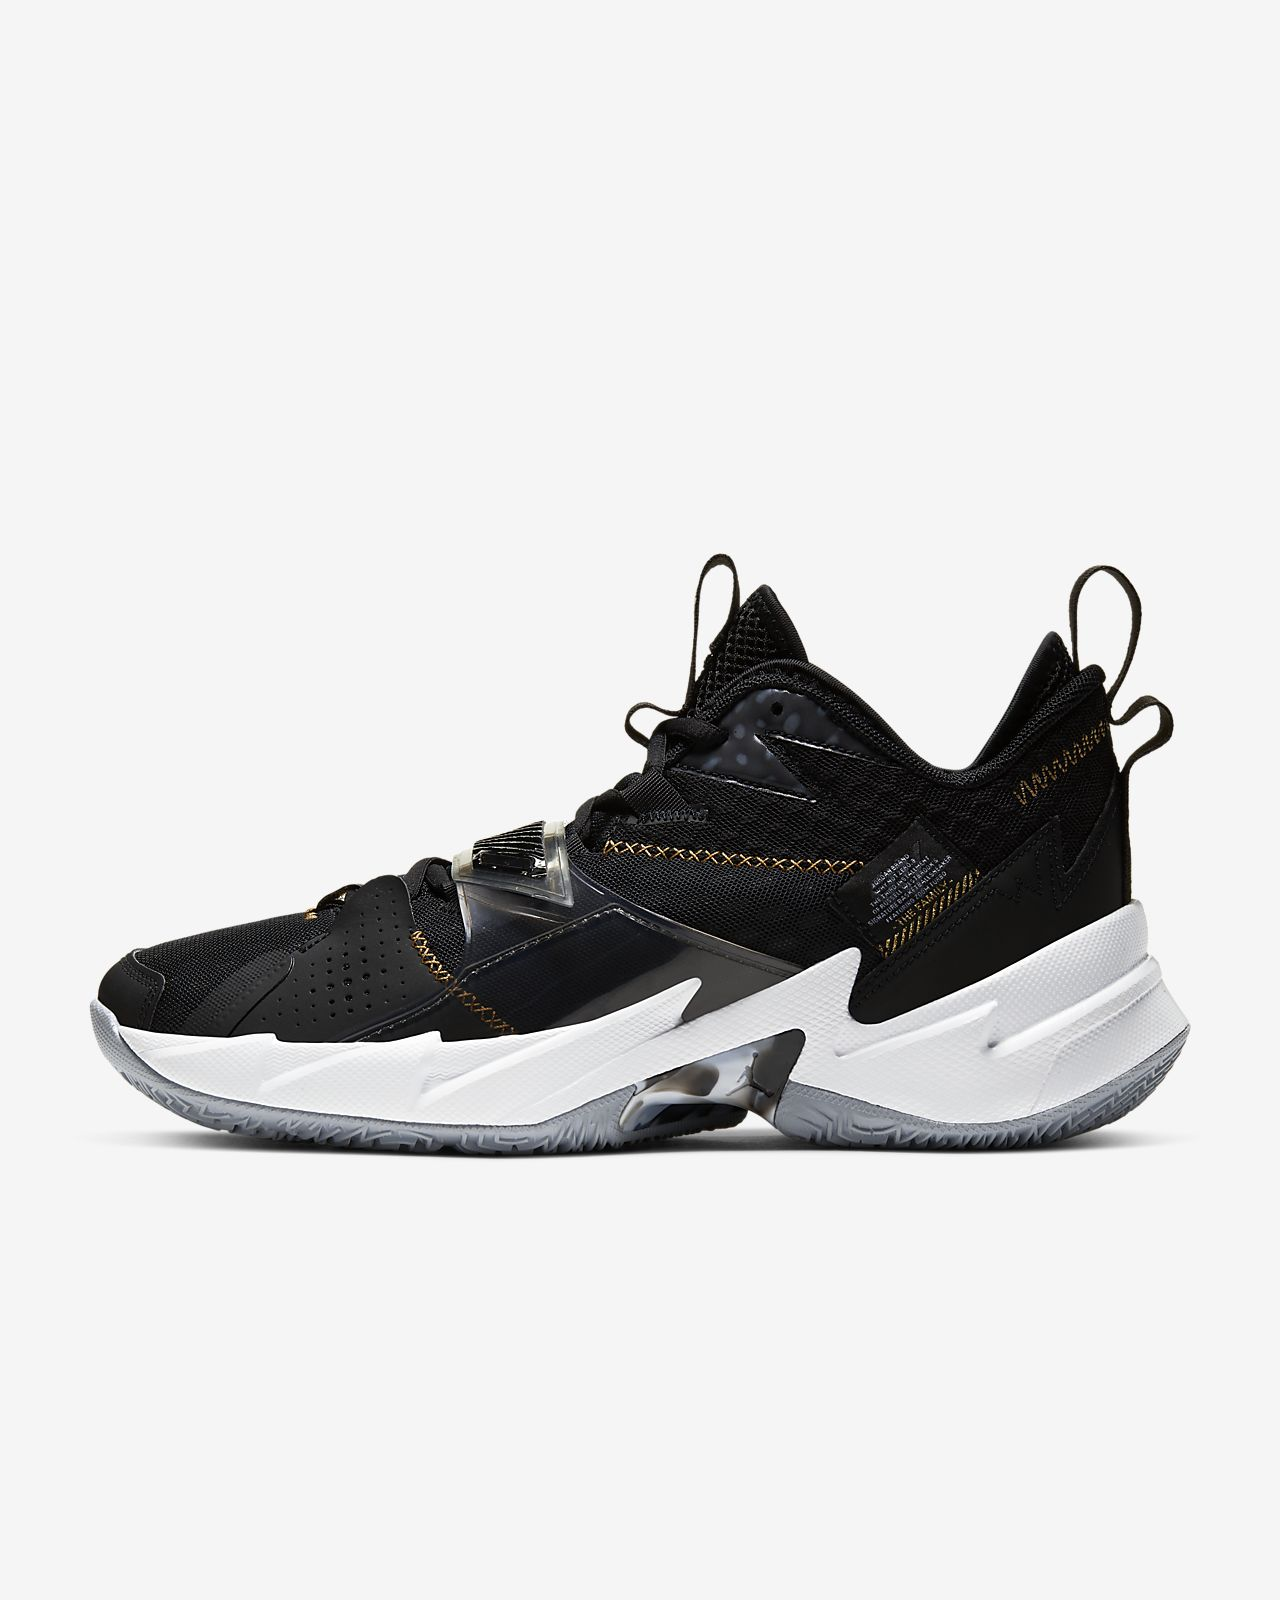 Jordan 'Why Not?' Zer0.3 Men's Basketball Shoe